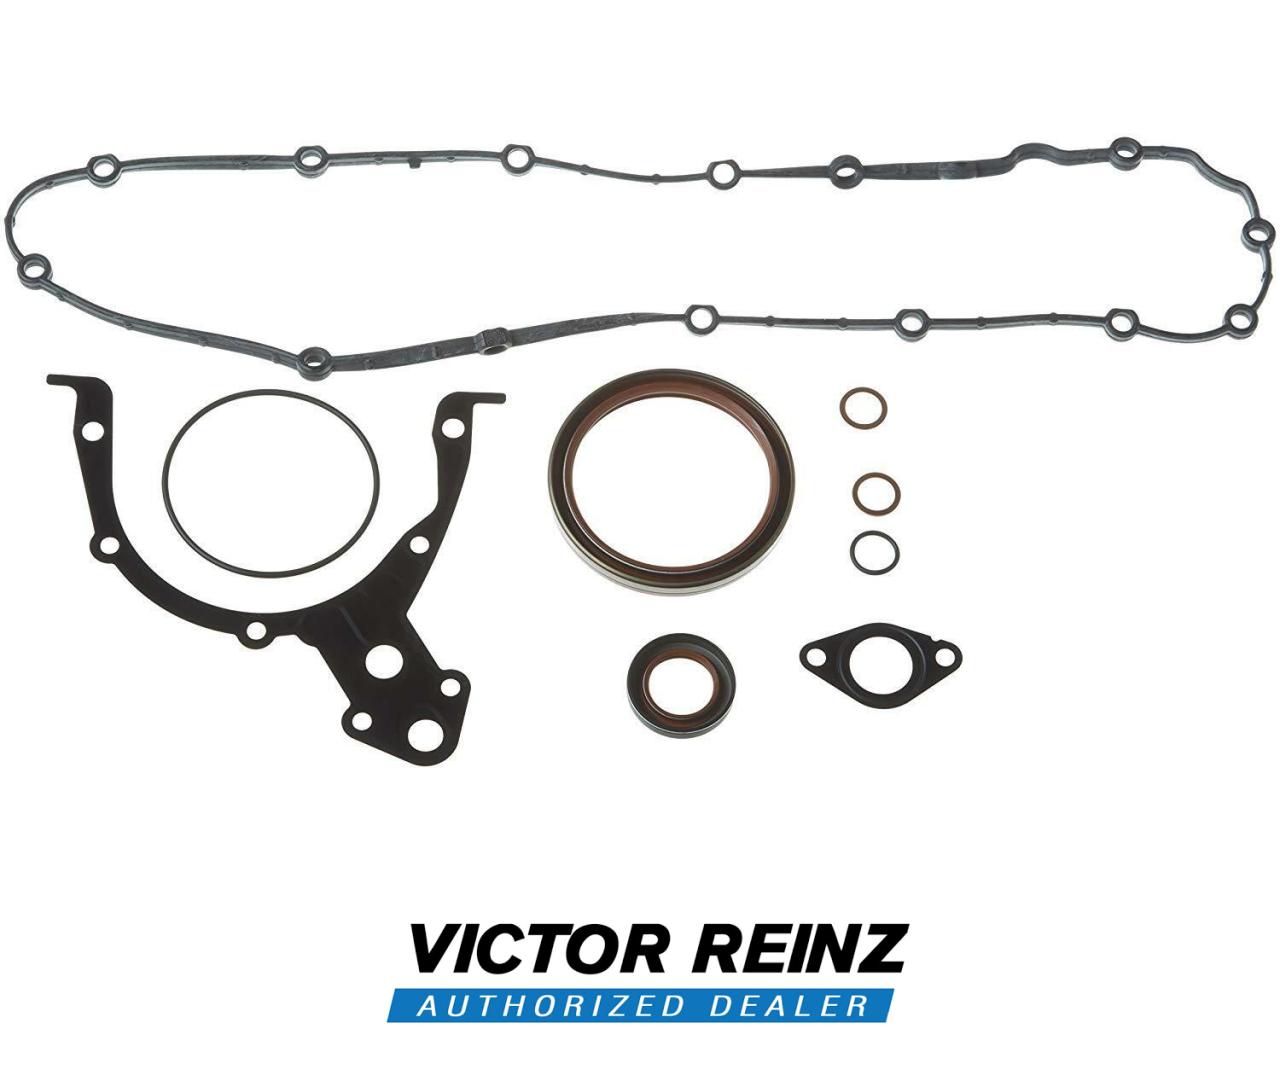 Opel Tigra A 1.6 Alt Takım Conta Victor Reinz